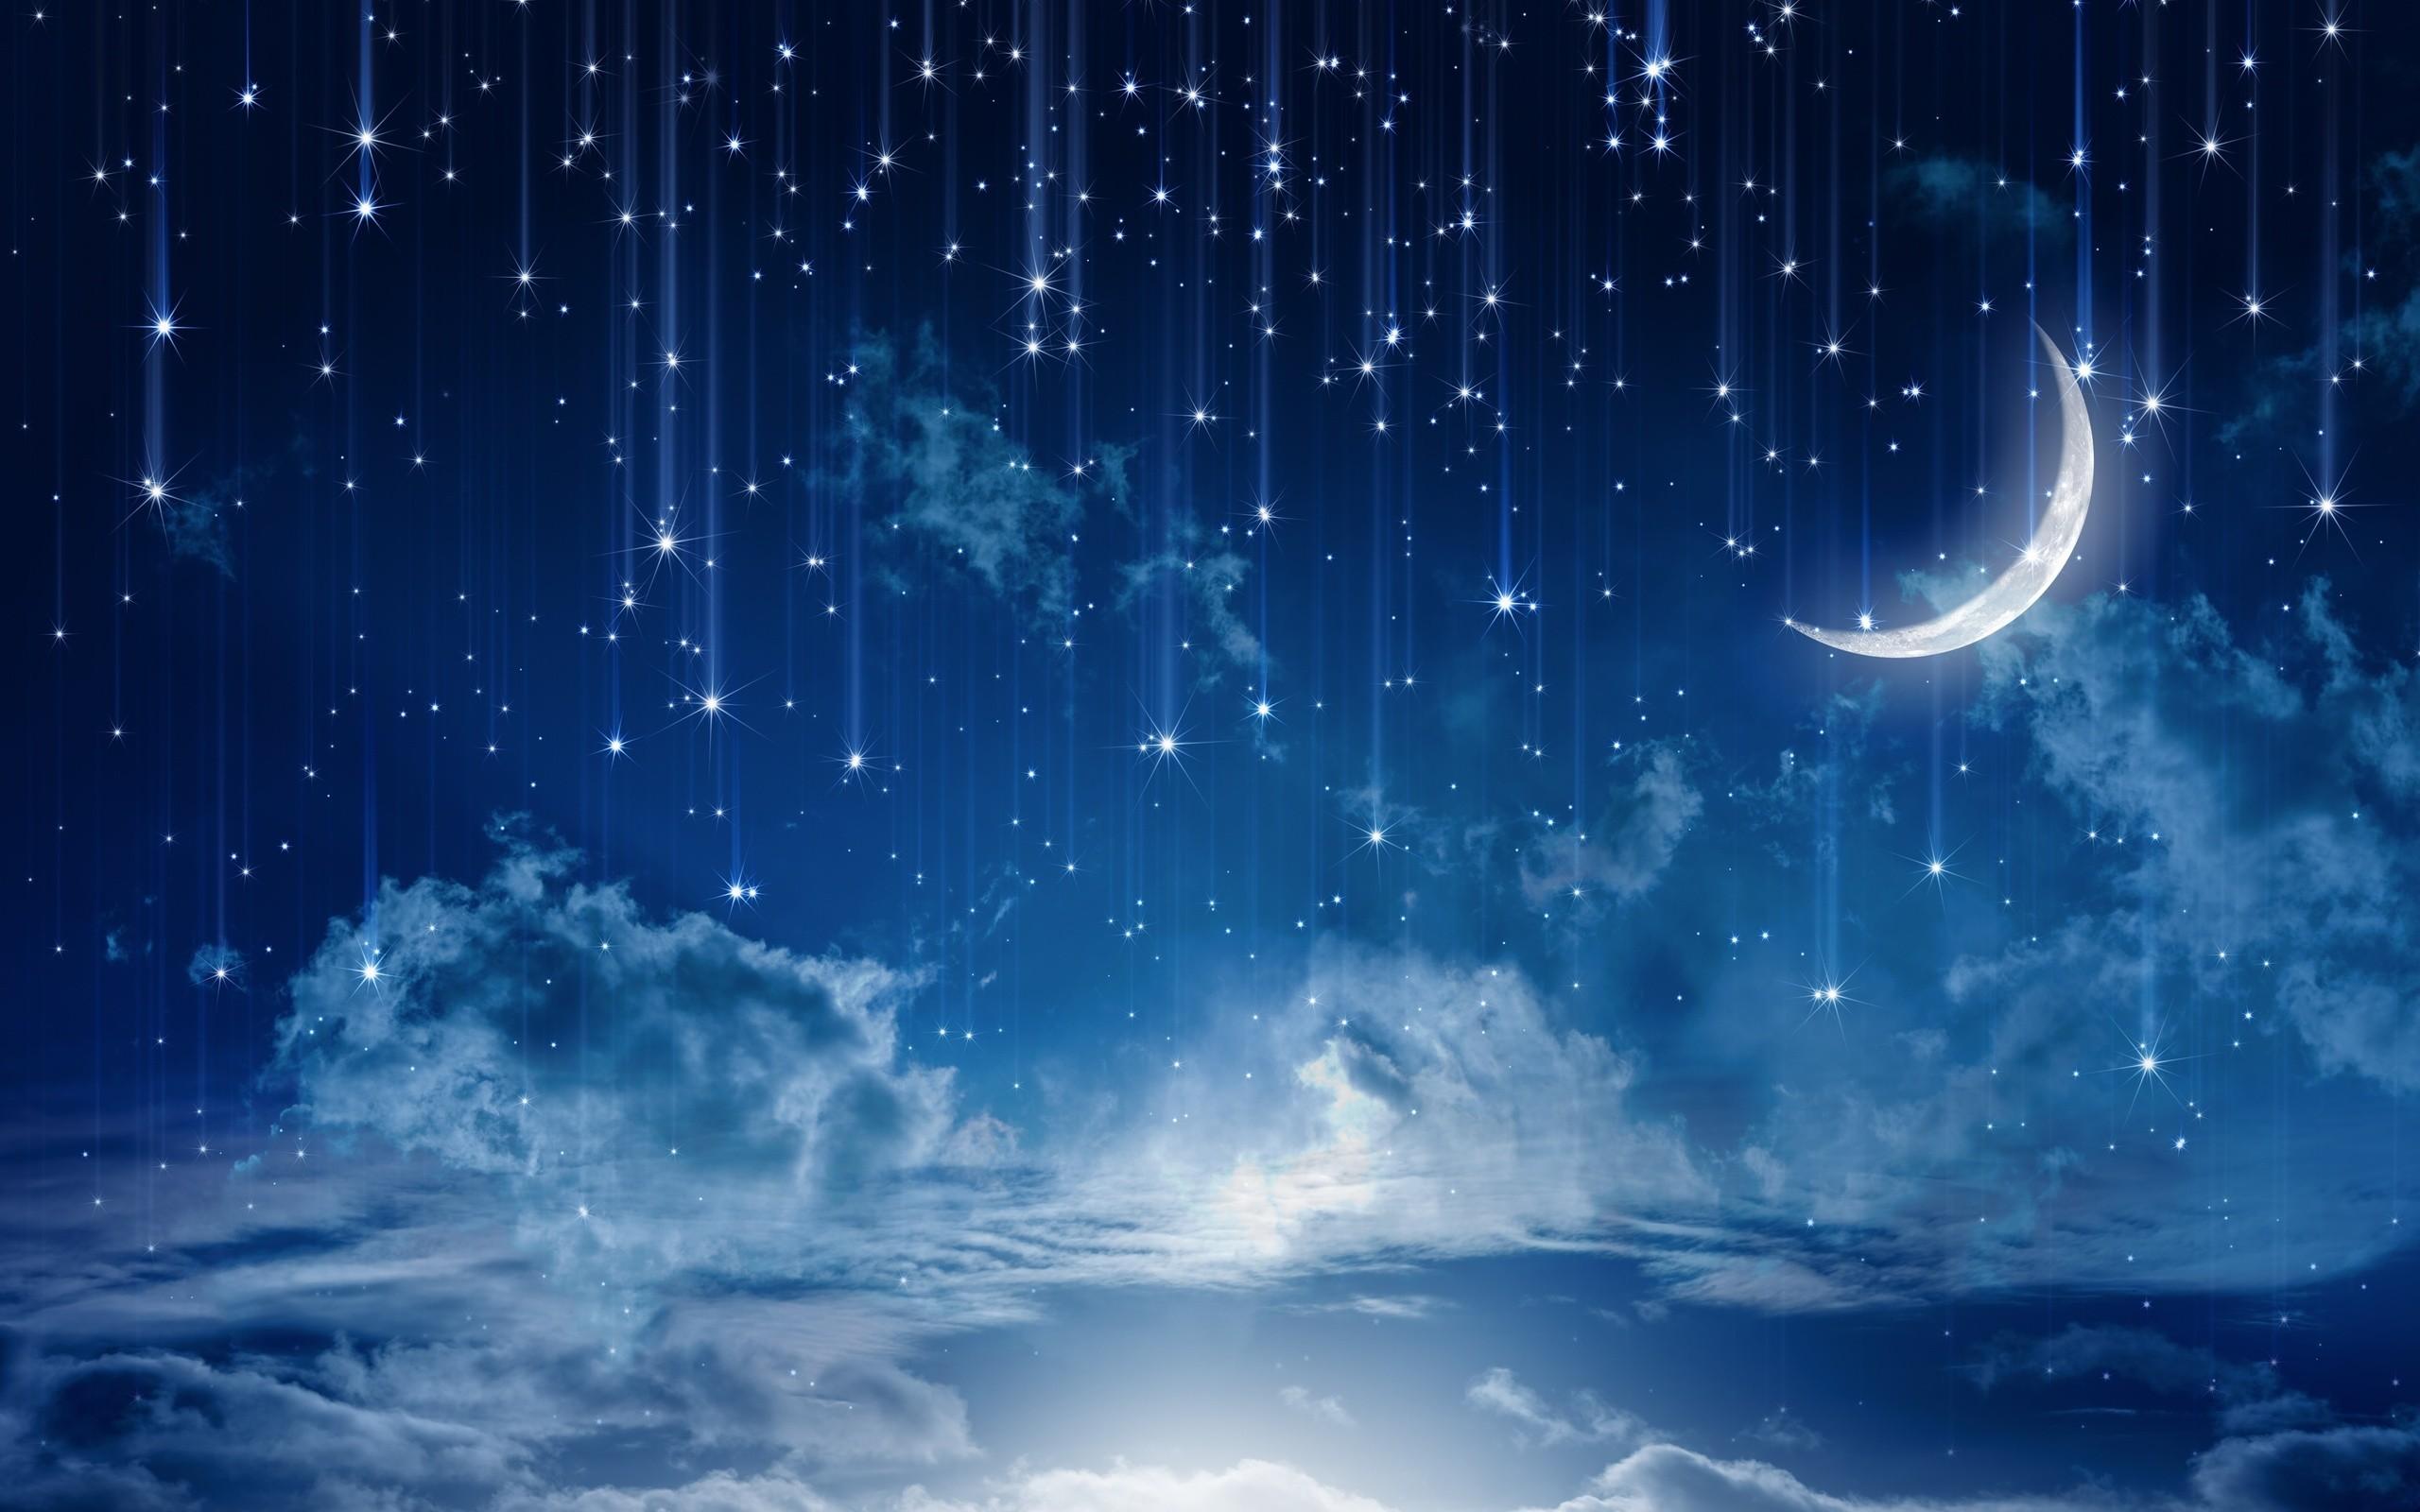 nature night stars clouds rain landscape moon wallpaper background .